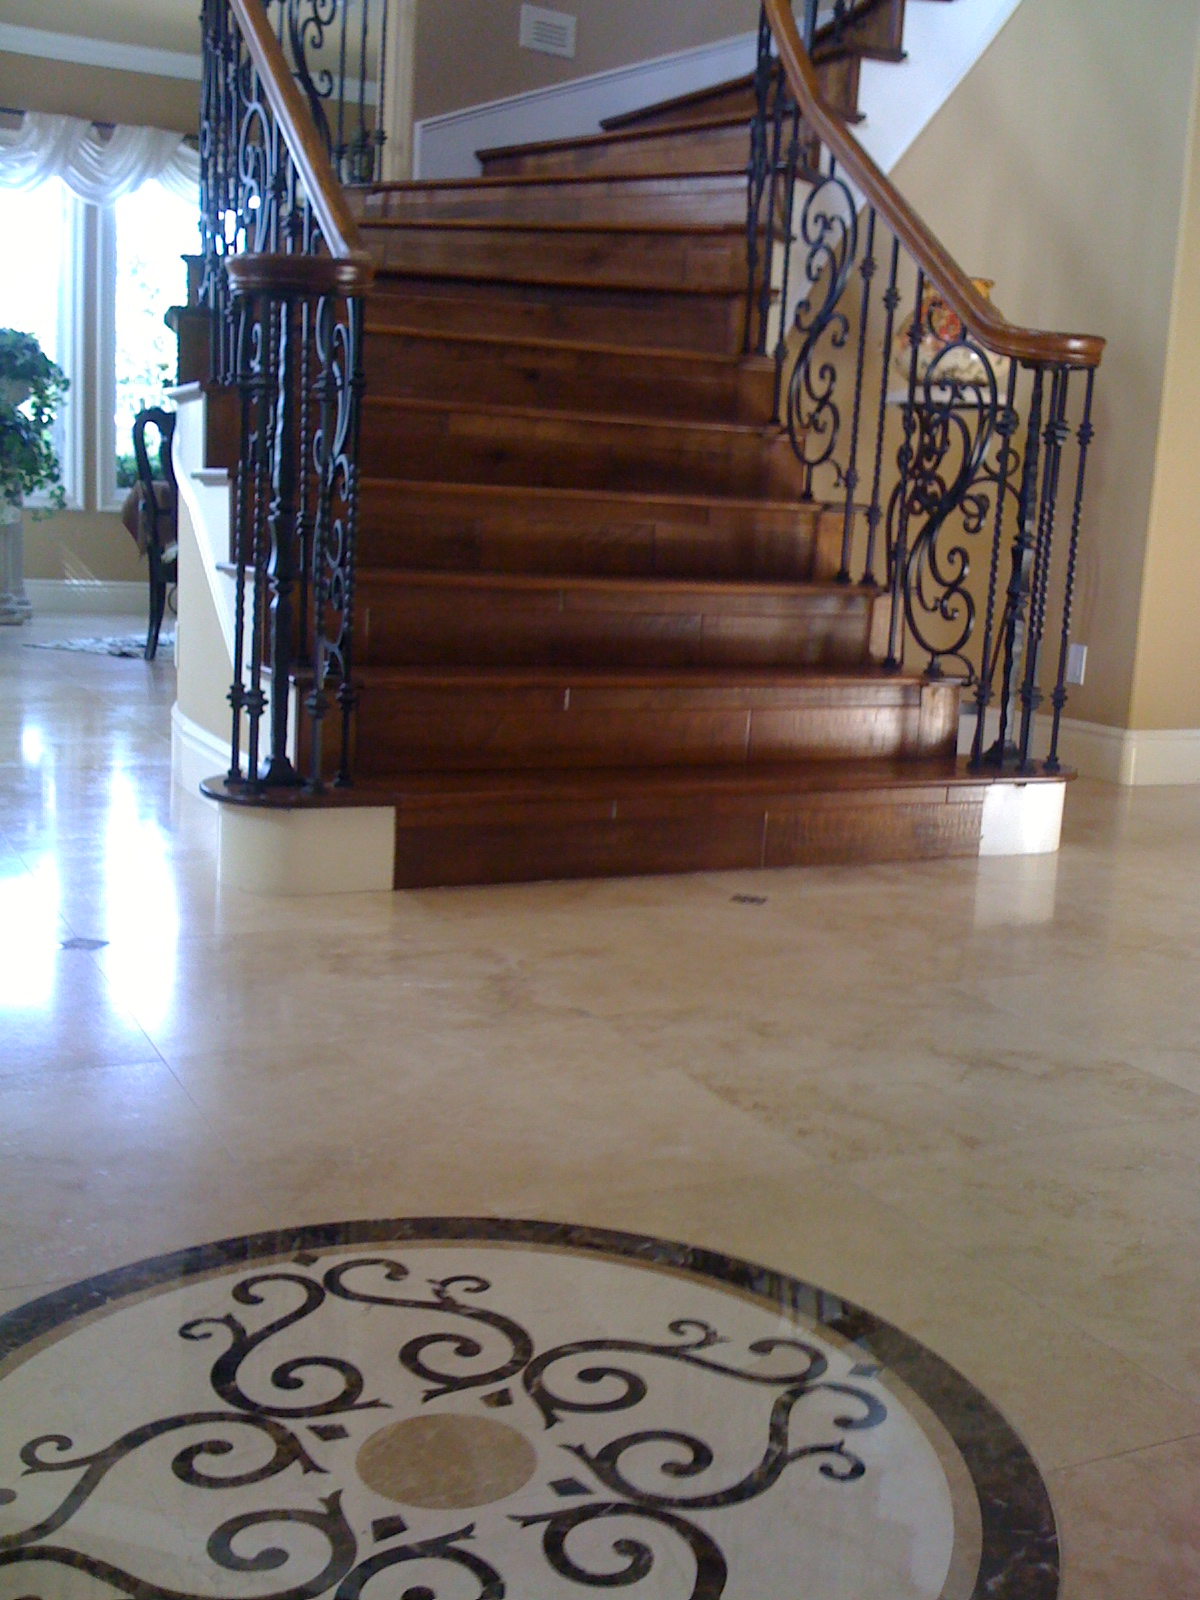 Travertine floor w/ marble medallion